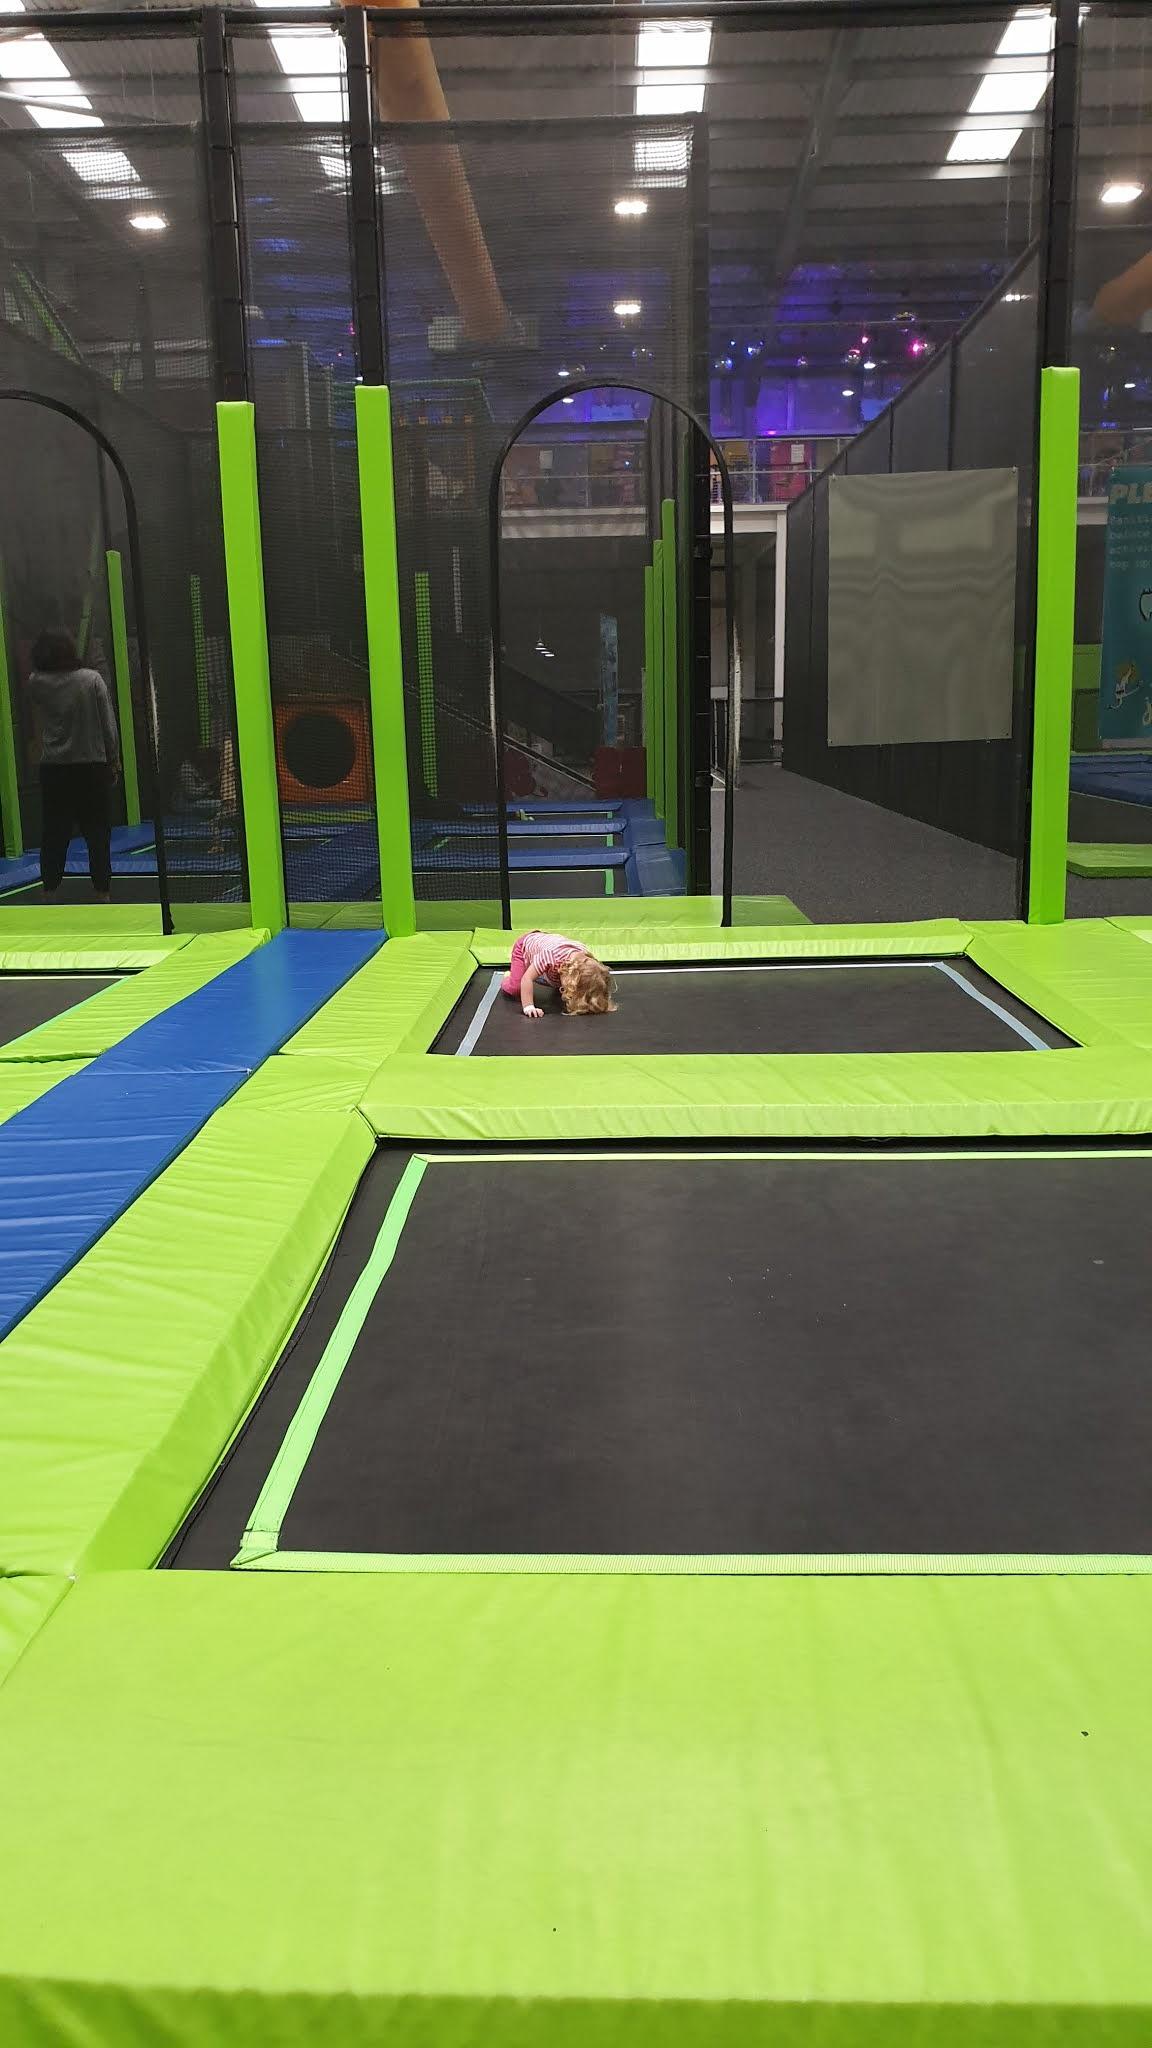 dodge ball area of trampoline park